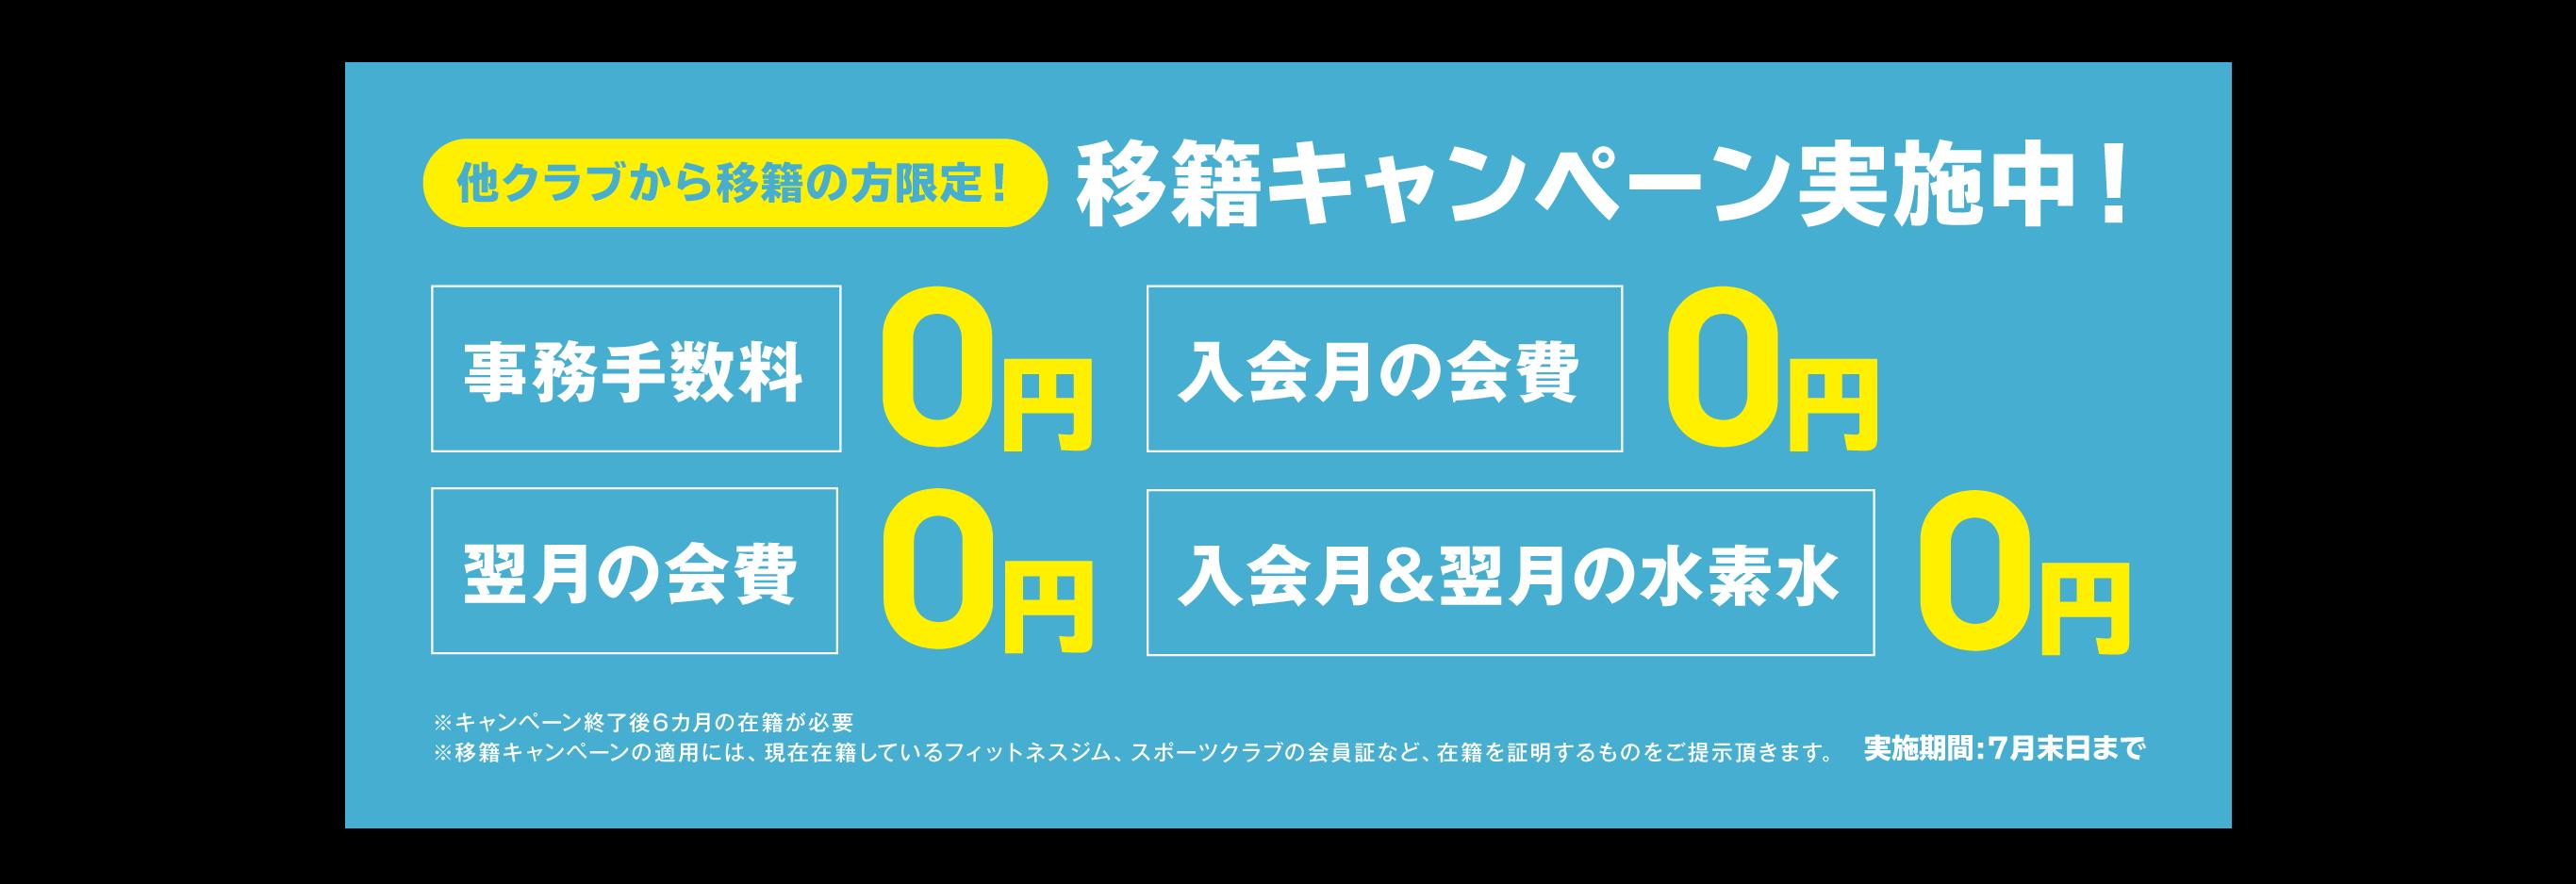 CAMPAIGN 6.1-6.16 キャンペーン実施中!